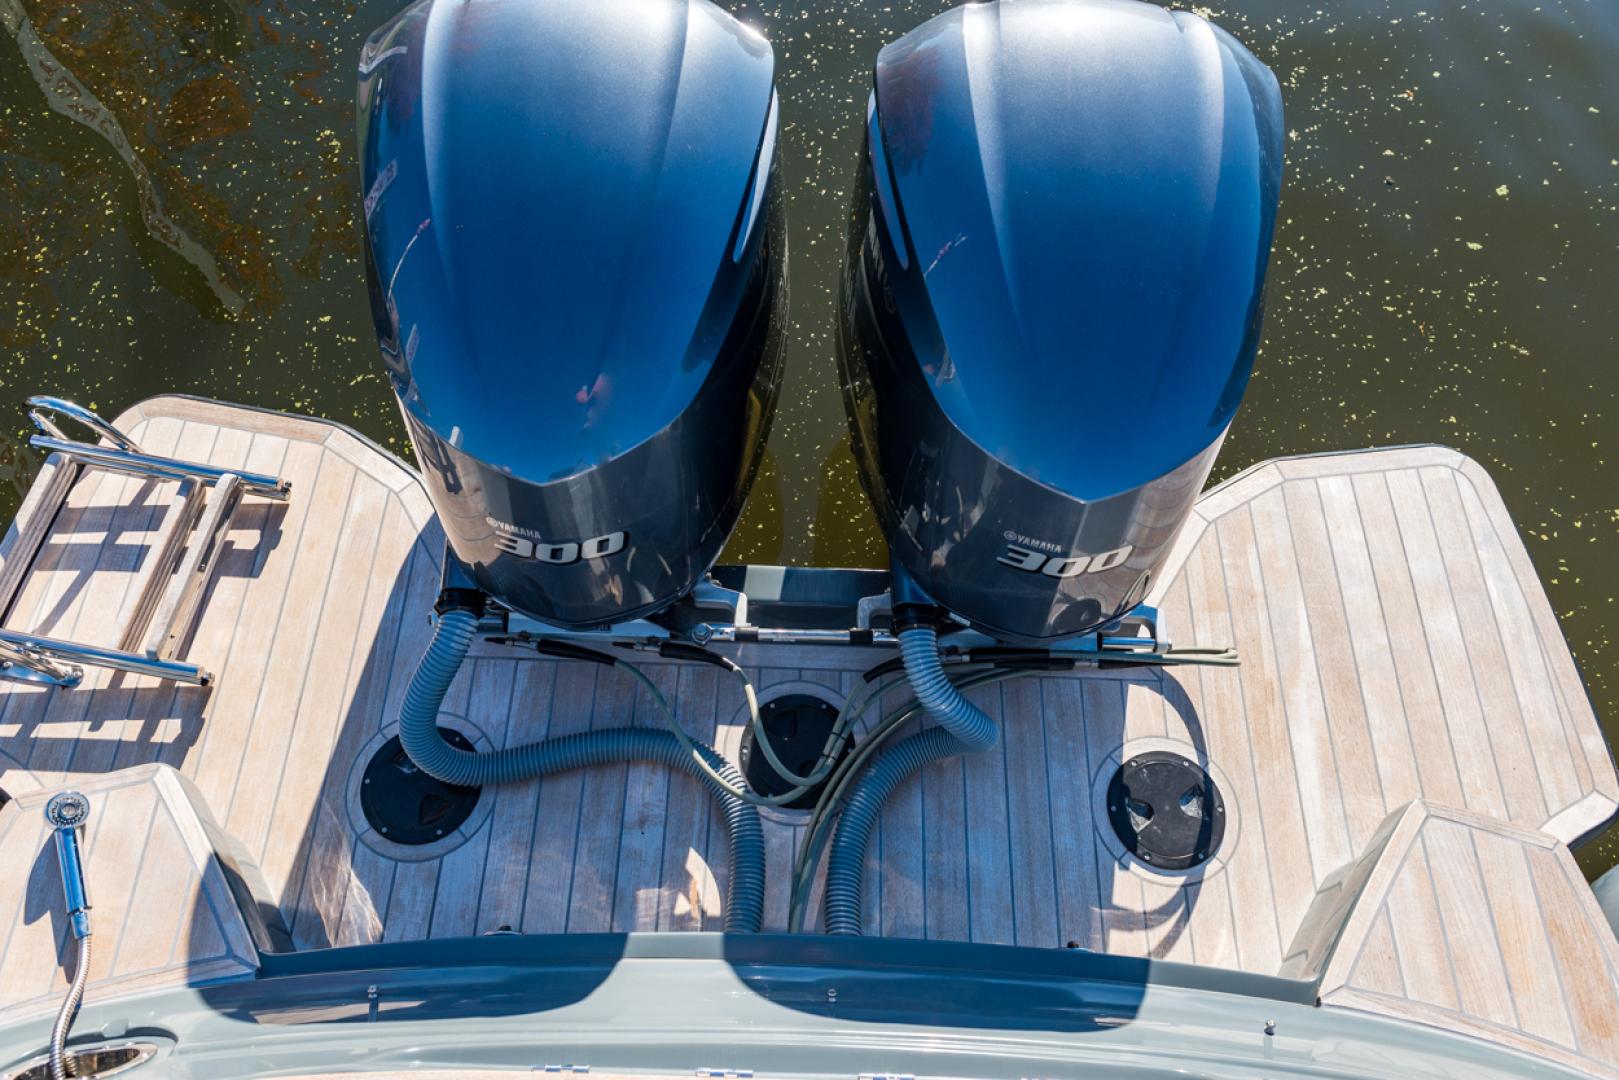 Sacs-Strider 11 2020-STRIDER 11 Fort Lauderdale-Florida-United States-1502462 | Thumbnail